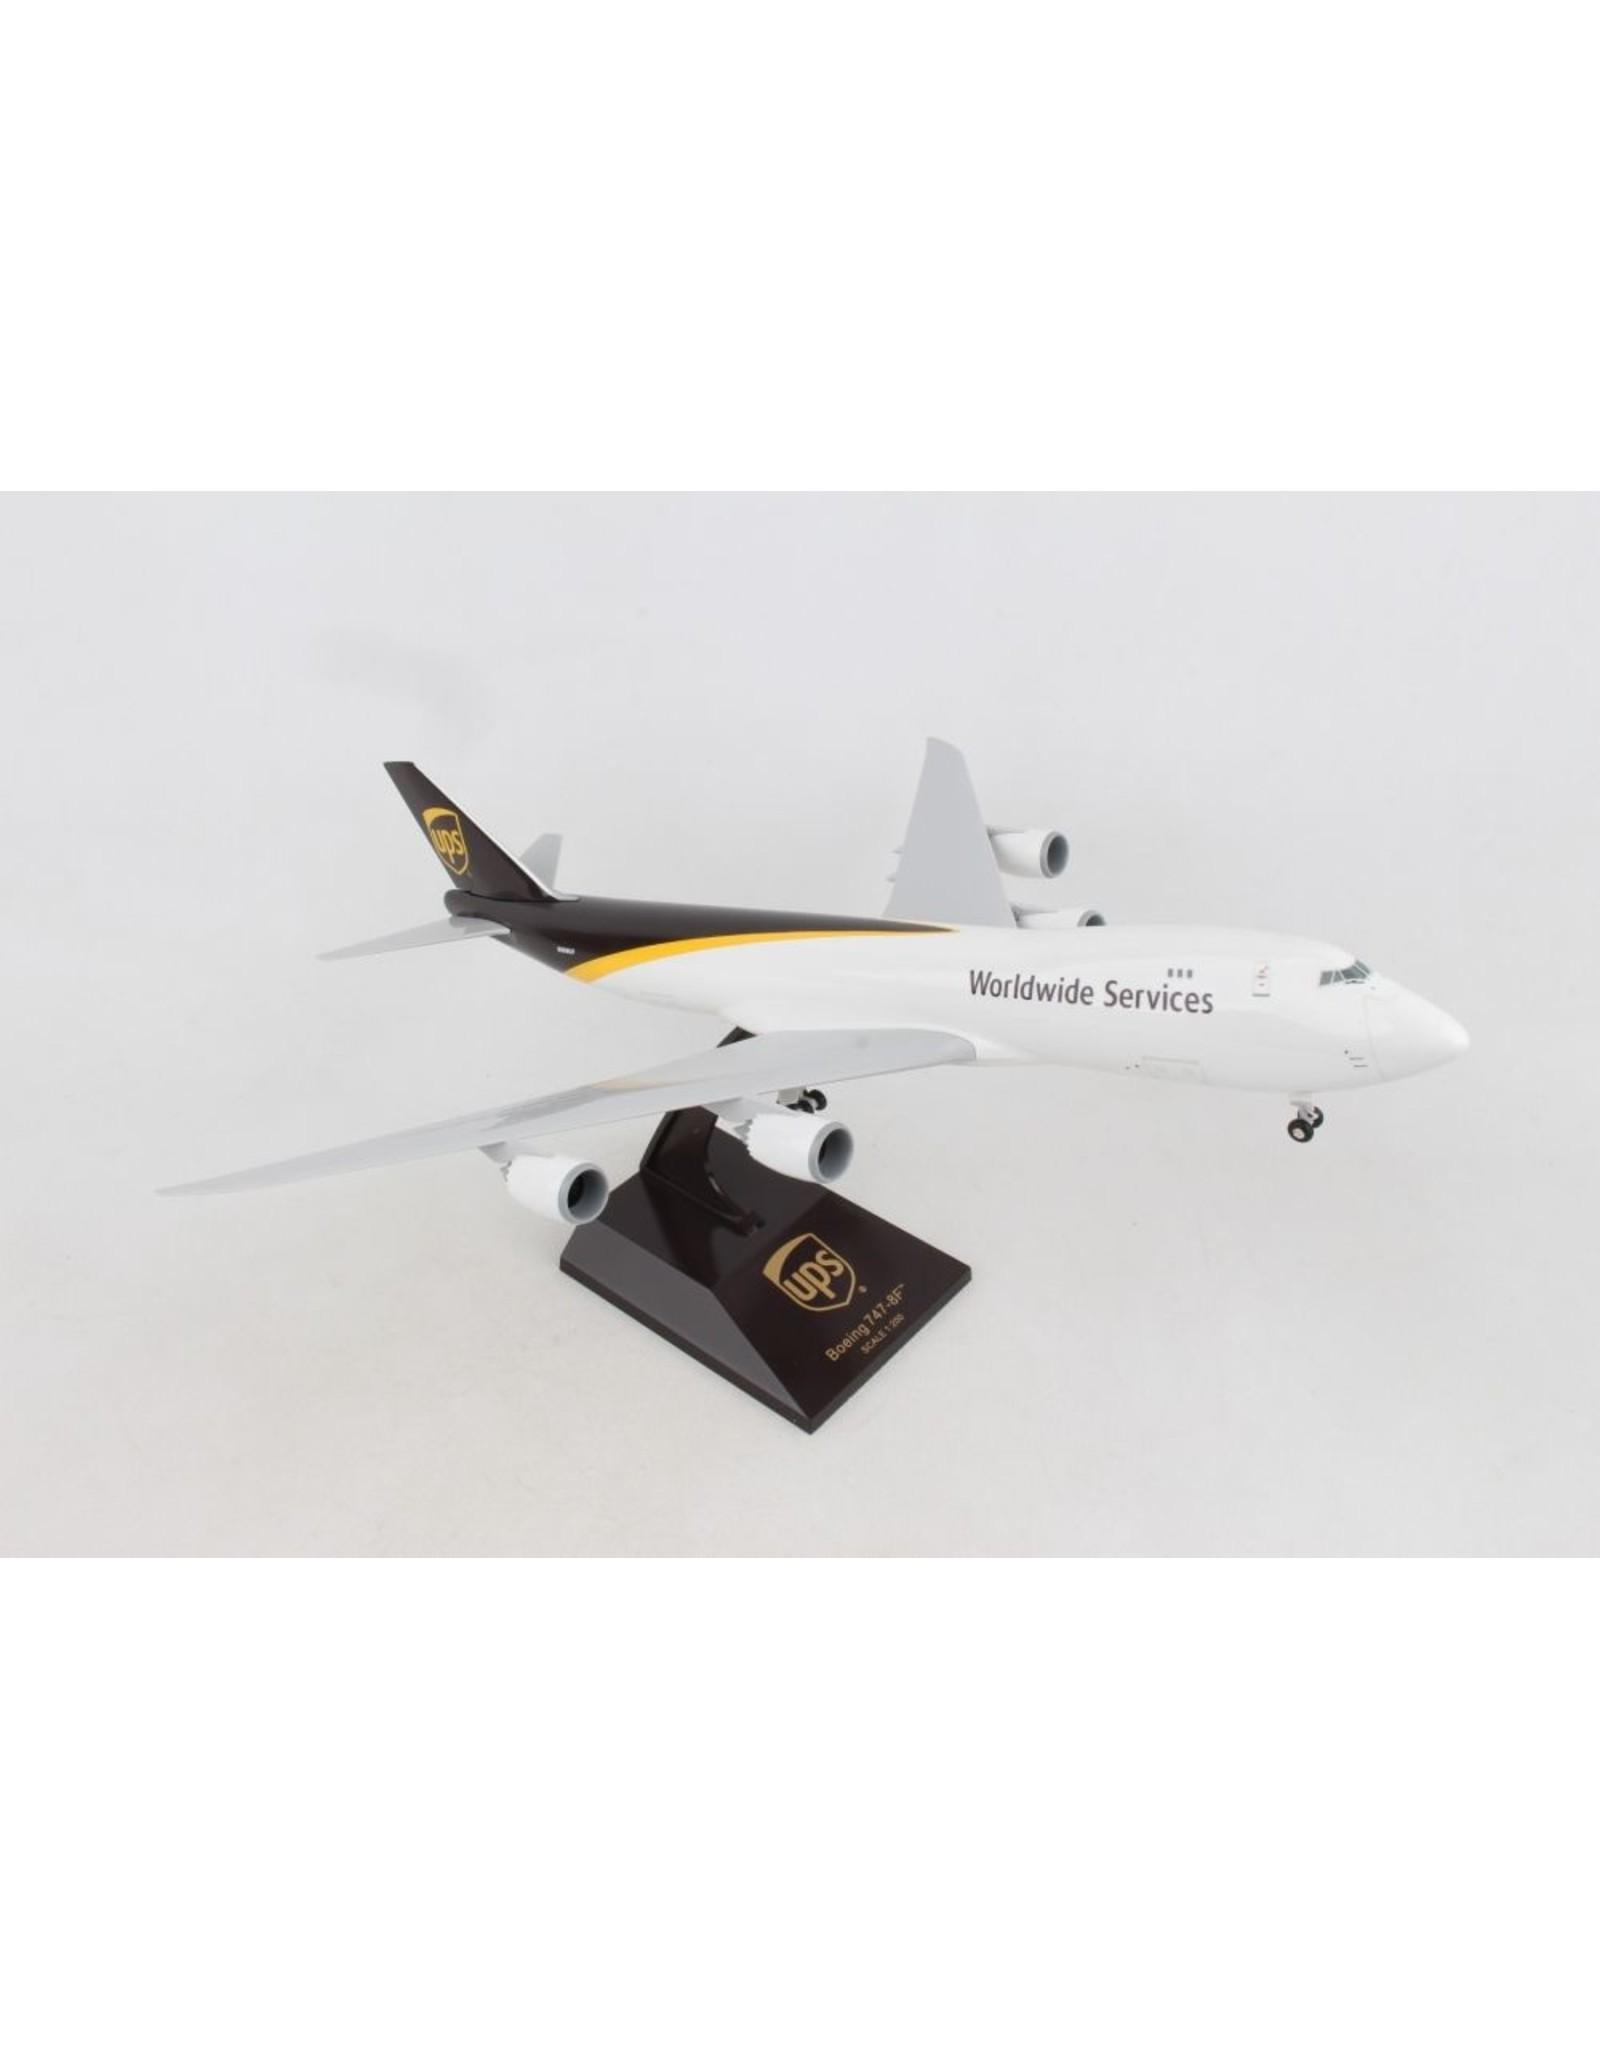 Skymarks Skymarks UPS 747-8F